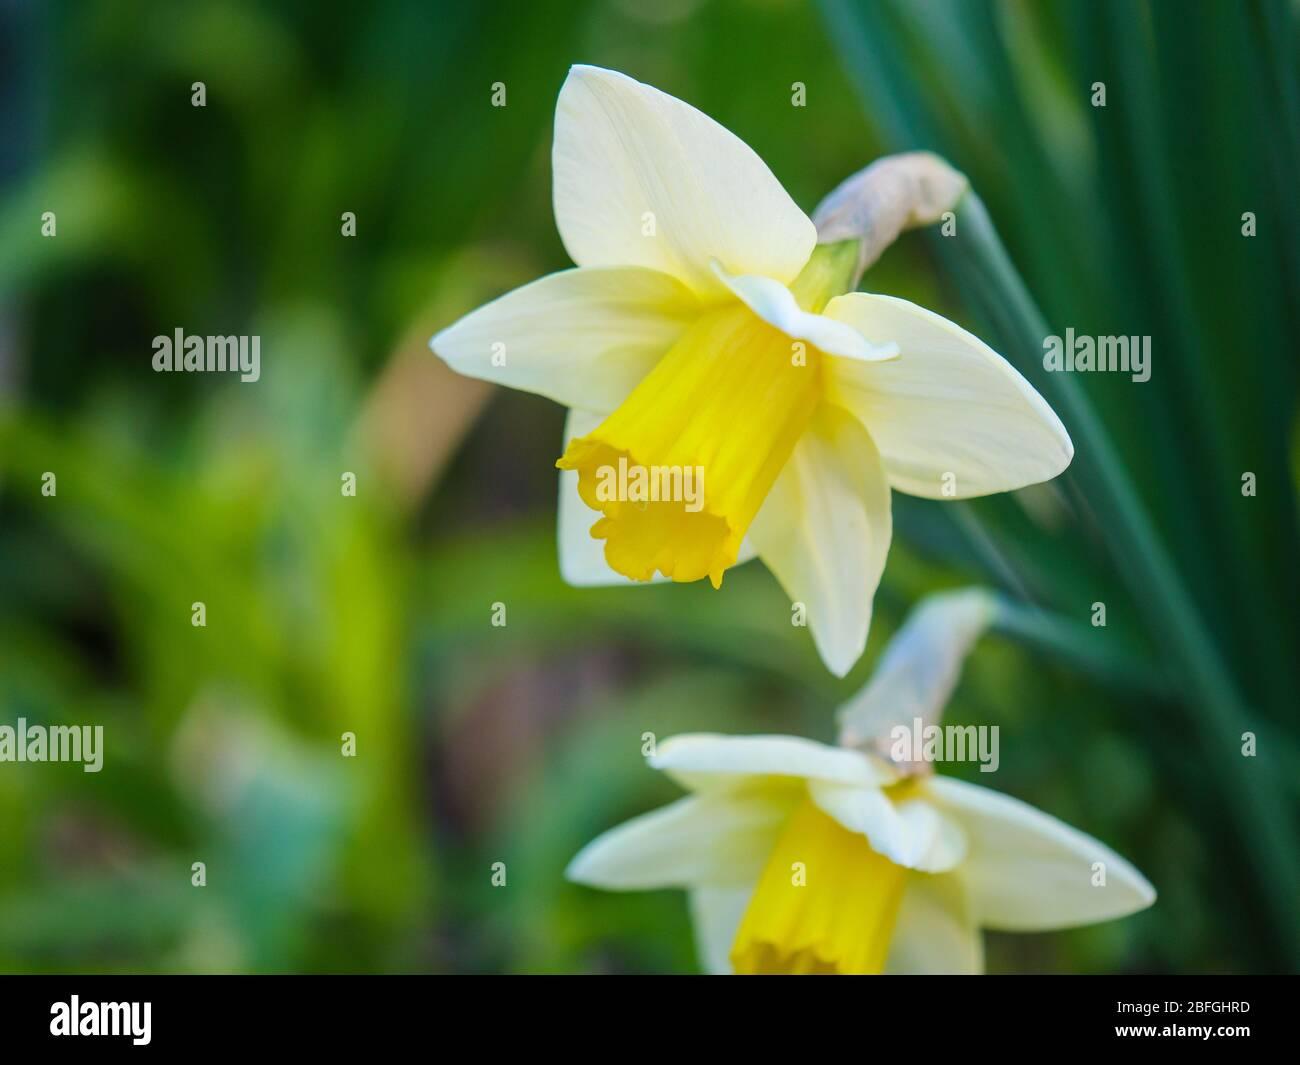 Daffodills in spring. Stock Photo